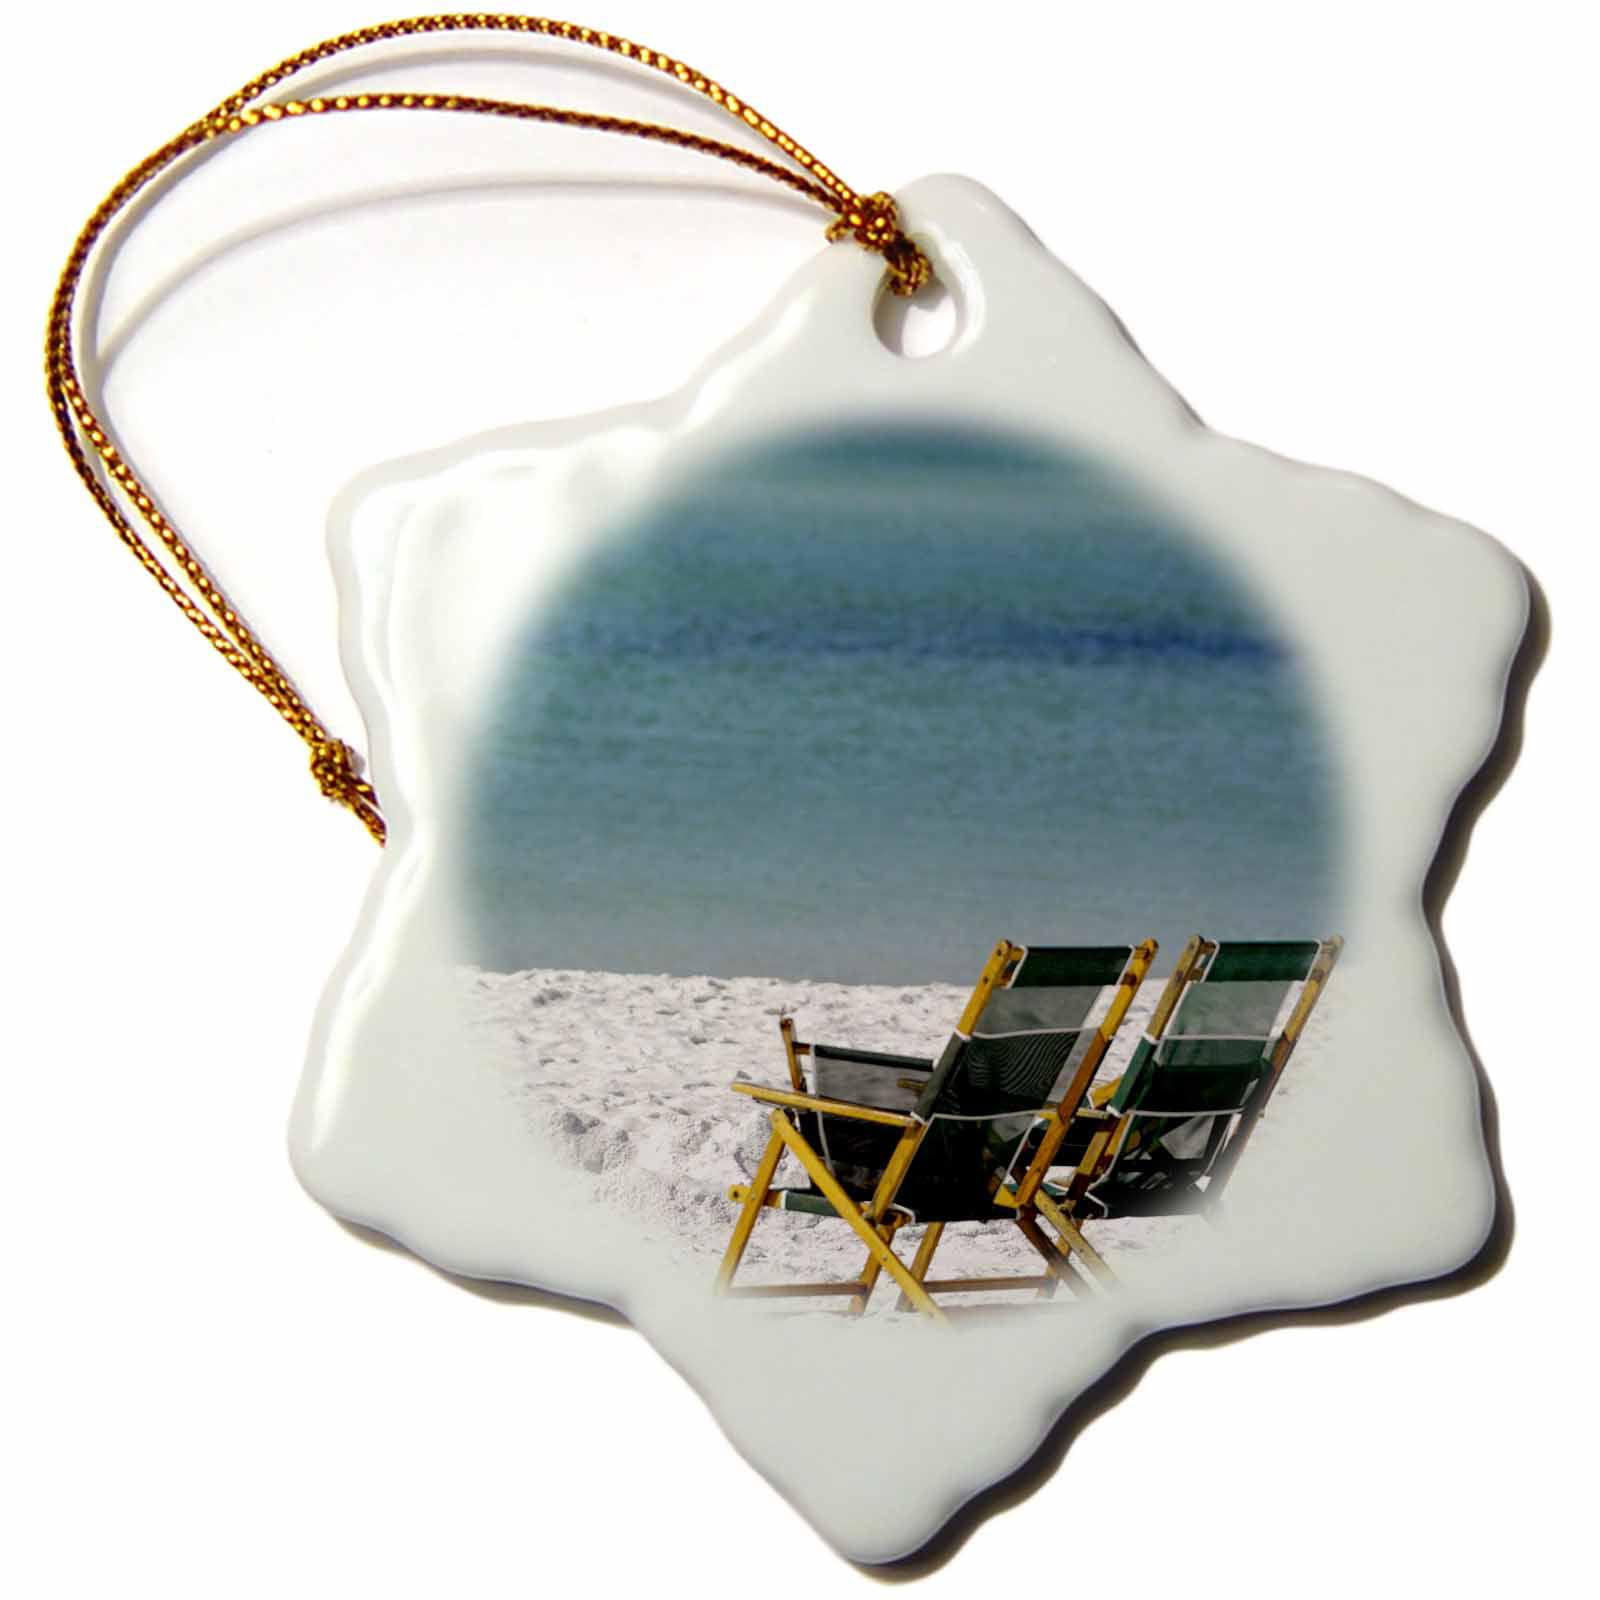 3dRose Adirondack Chairs, Fort Walton Beach, Florida - US10 FVI0018 - Franklin Viola, Snowflake Ornament, Porcelain, 3-inch